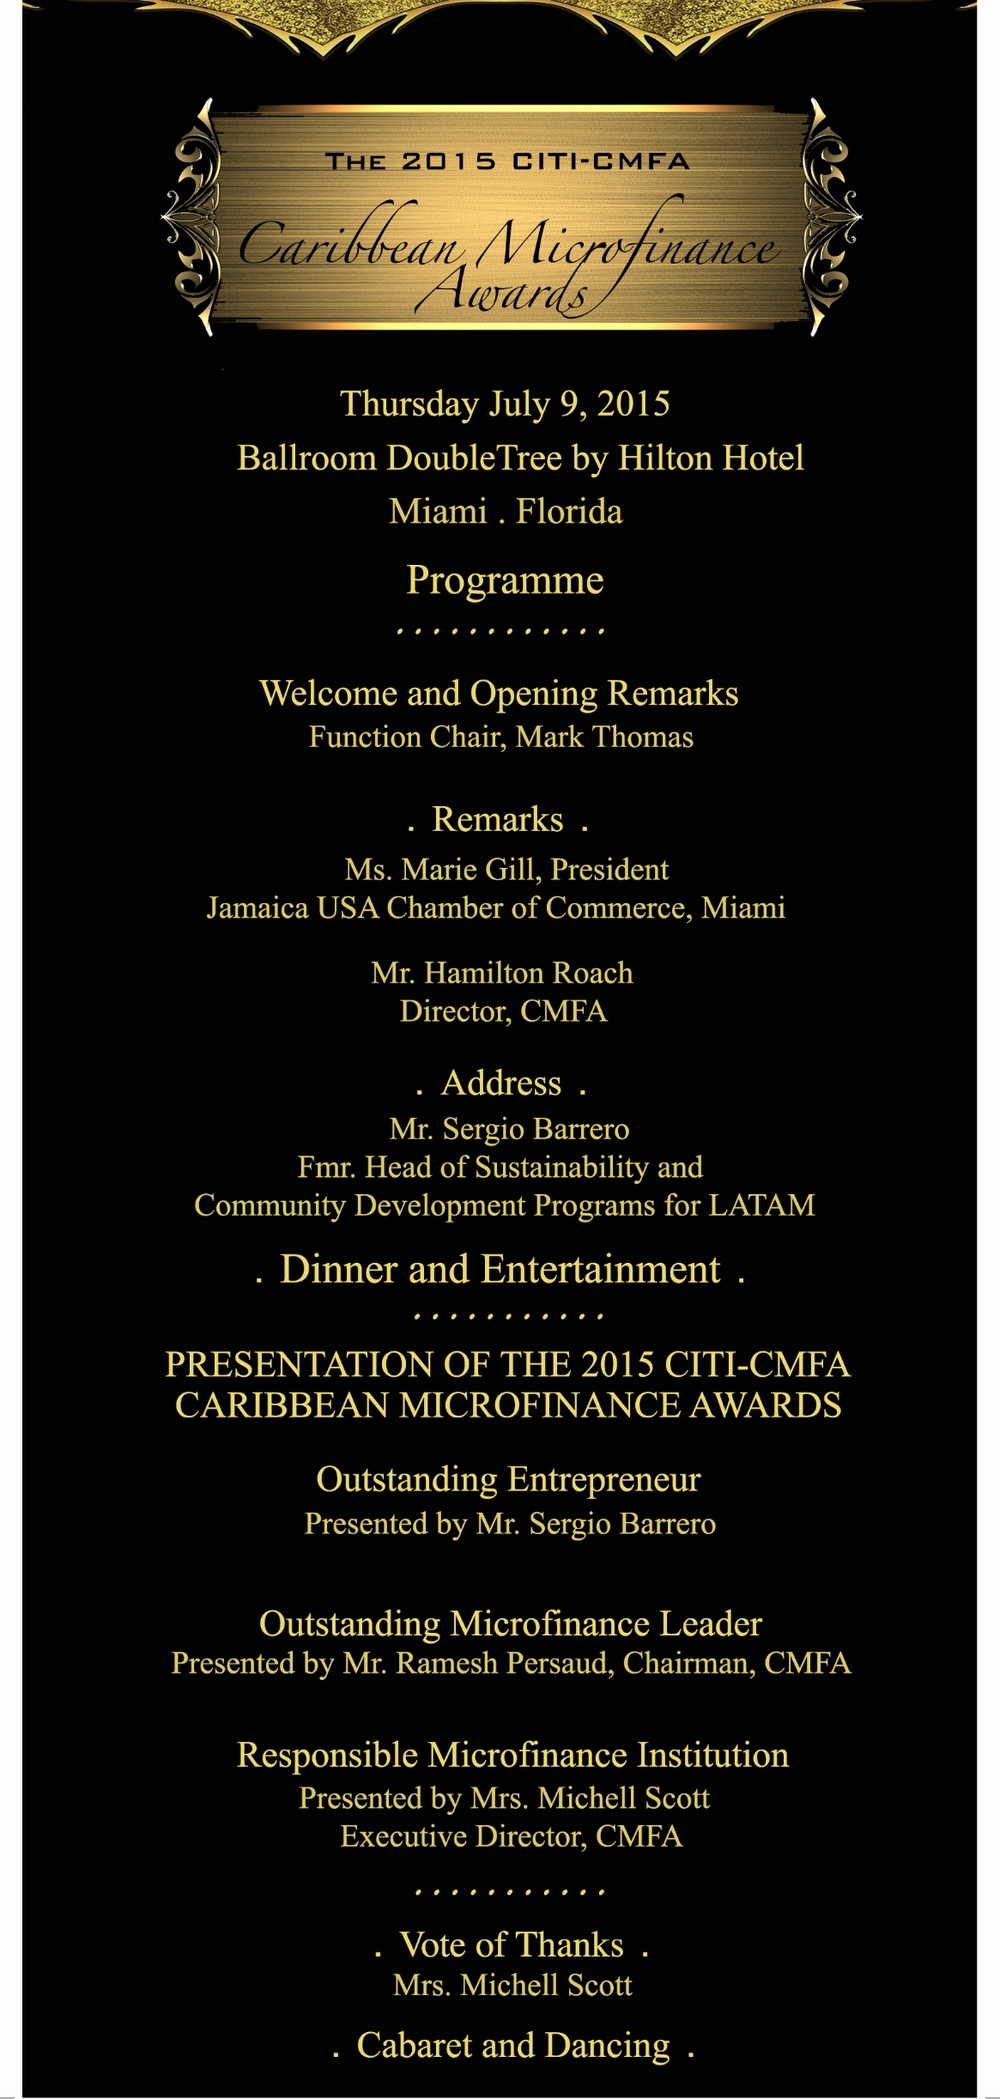 CMFA Programme Img8 - June 27.jpg